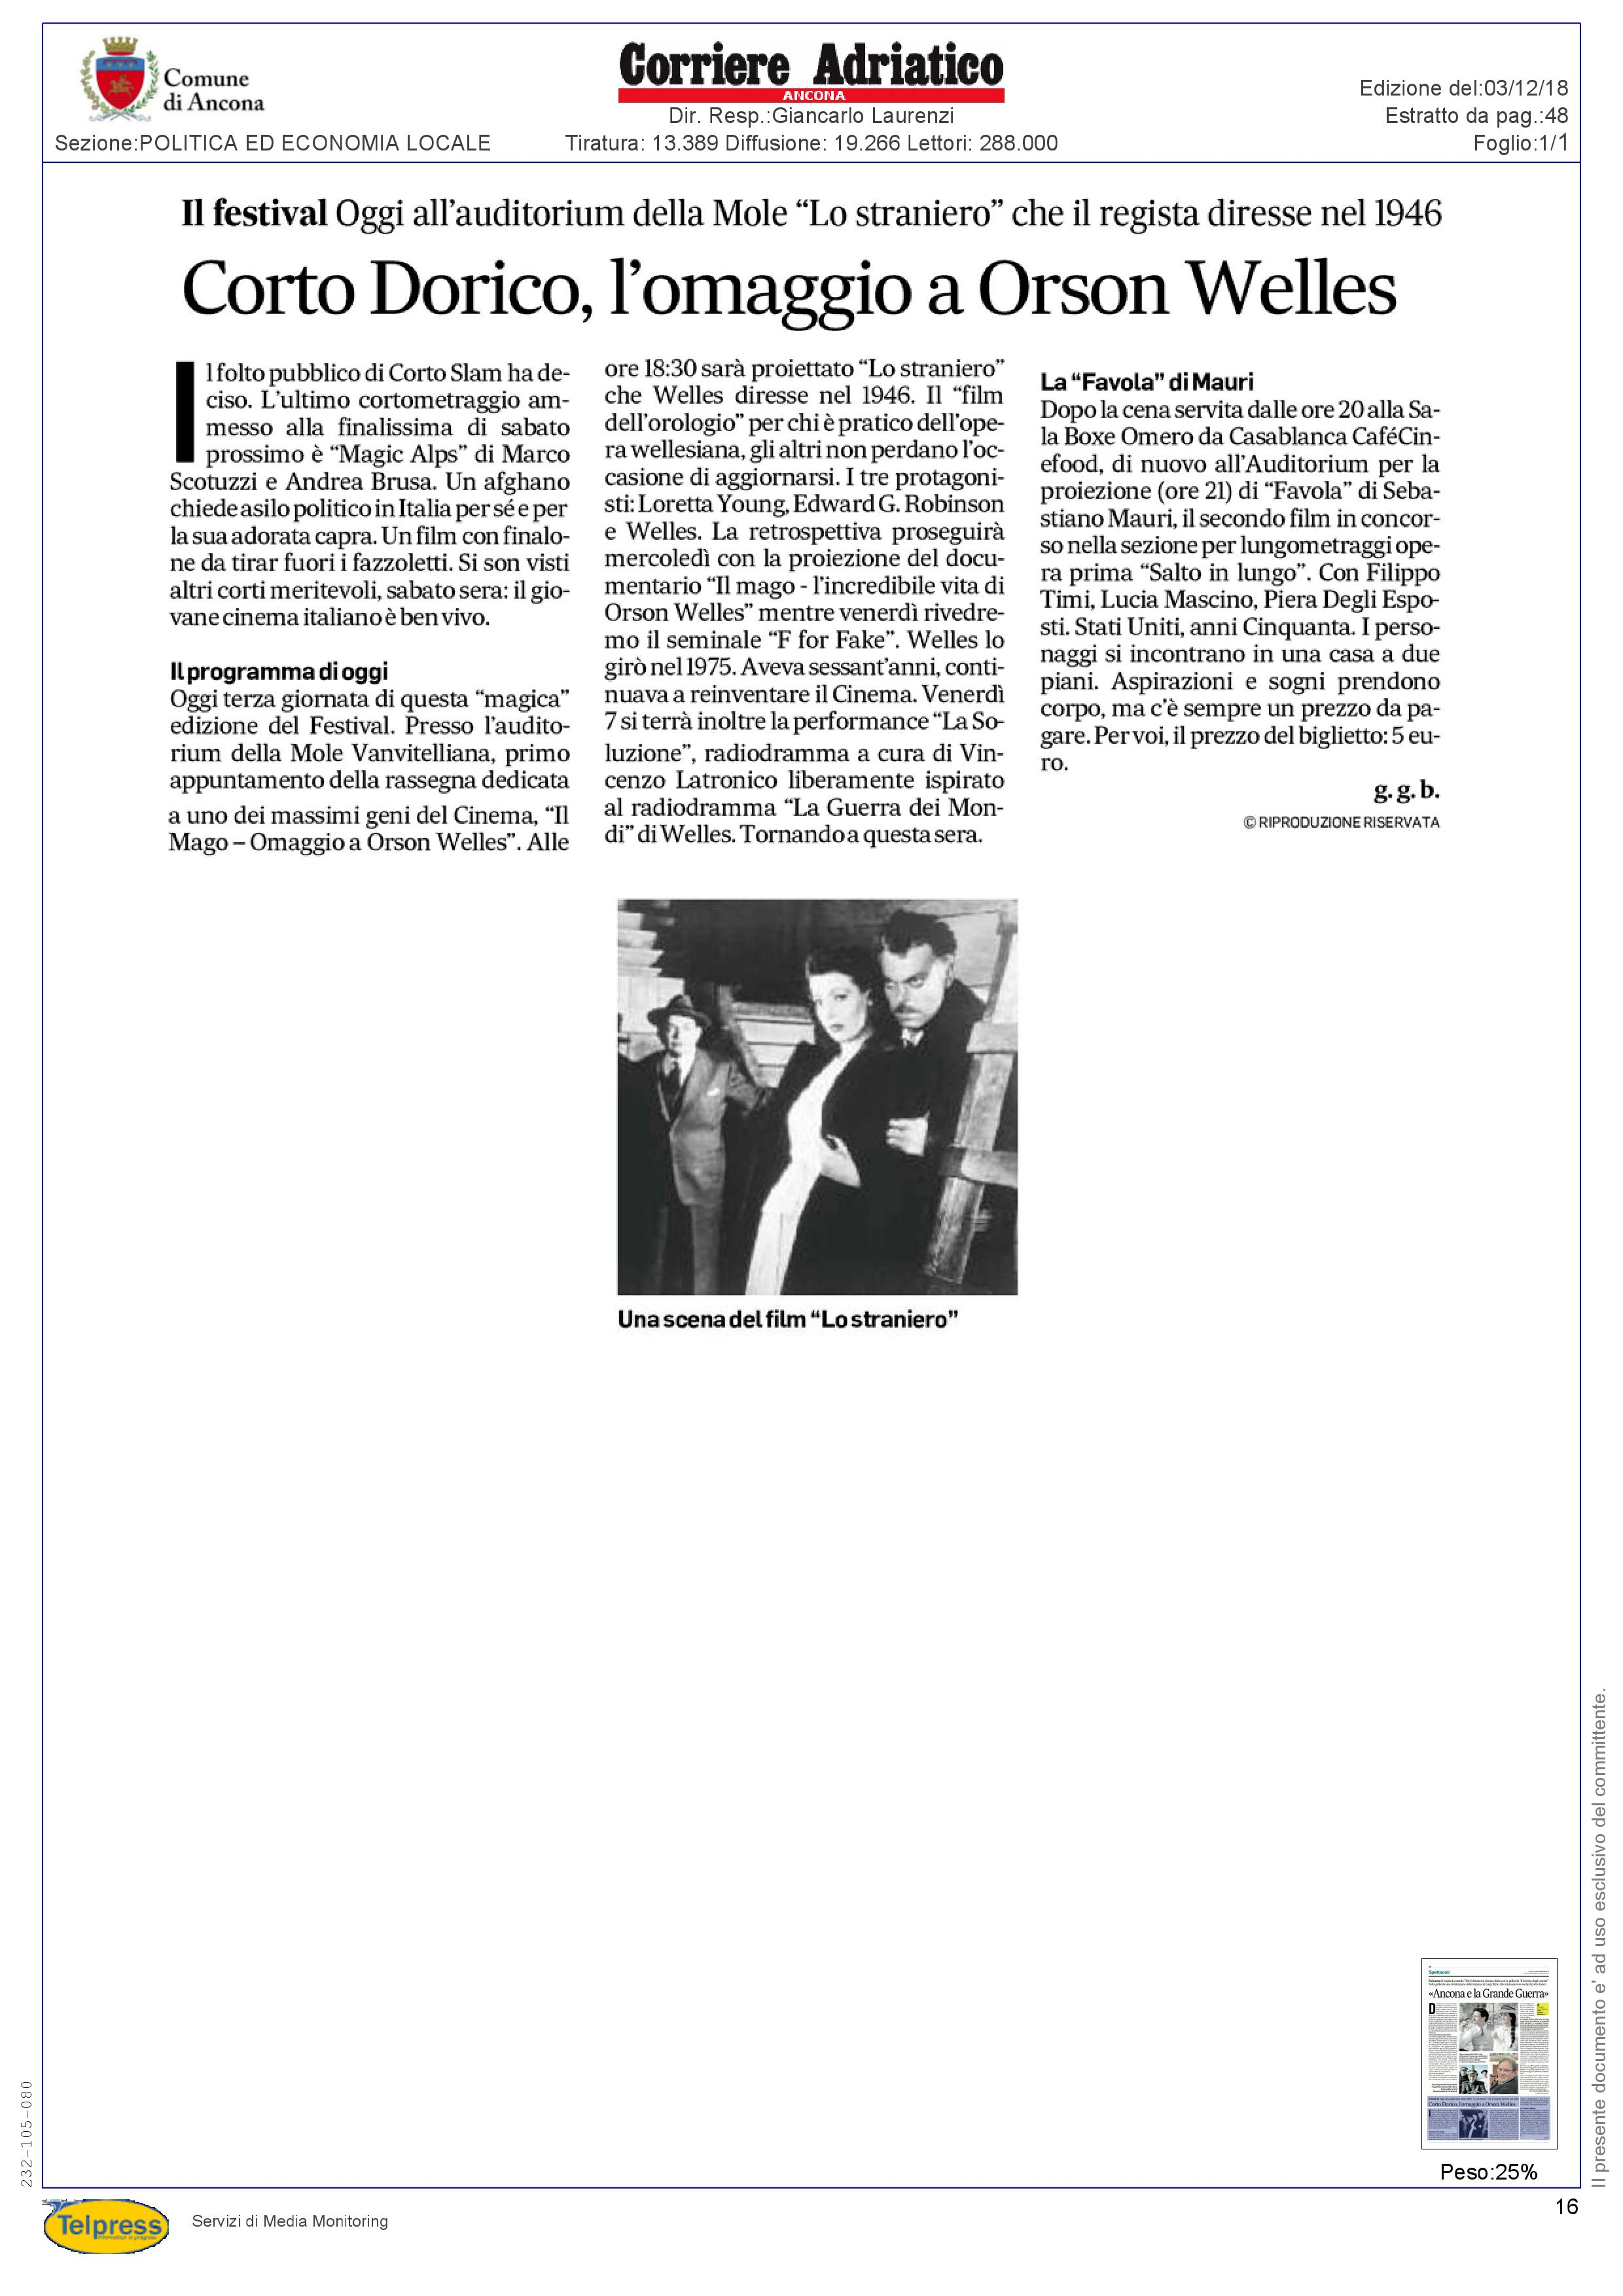 3-12-18 Corriere Adriatico